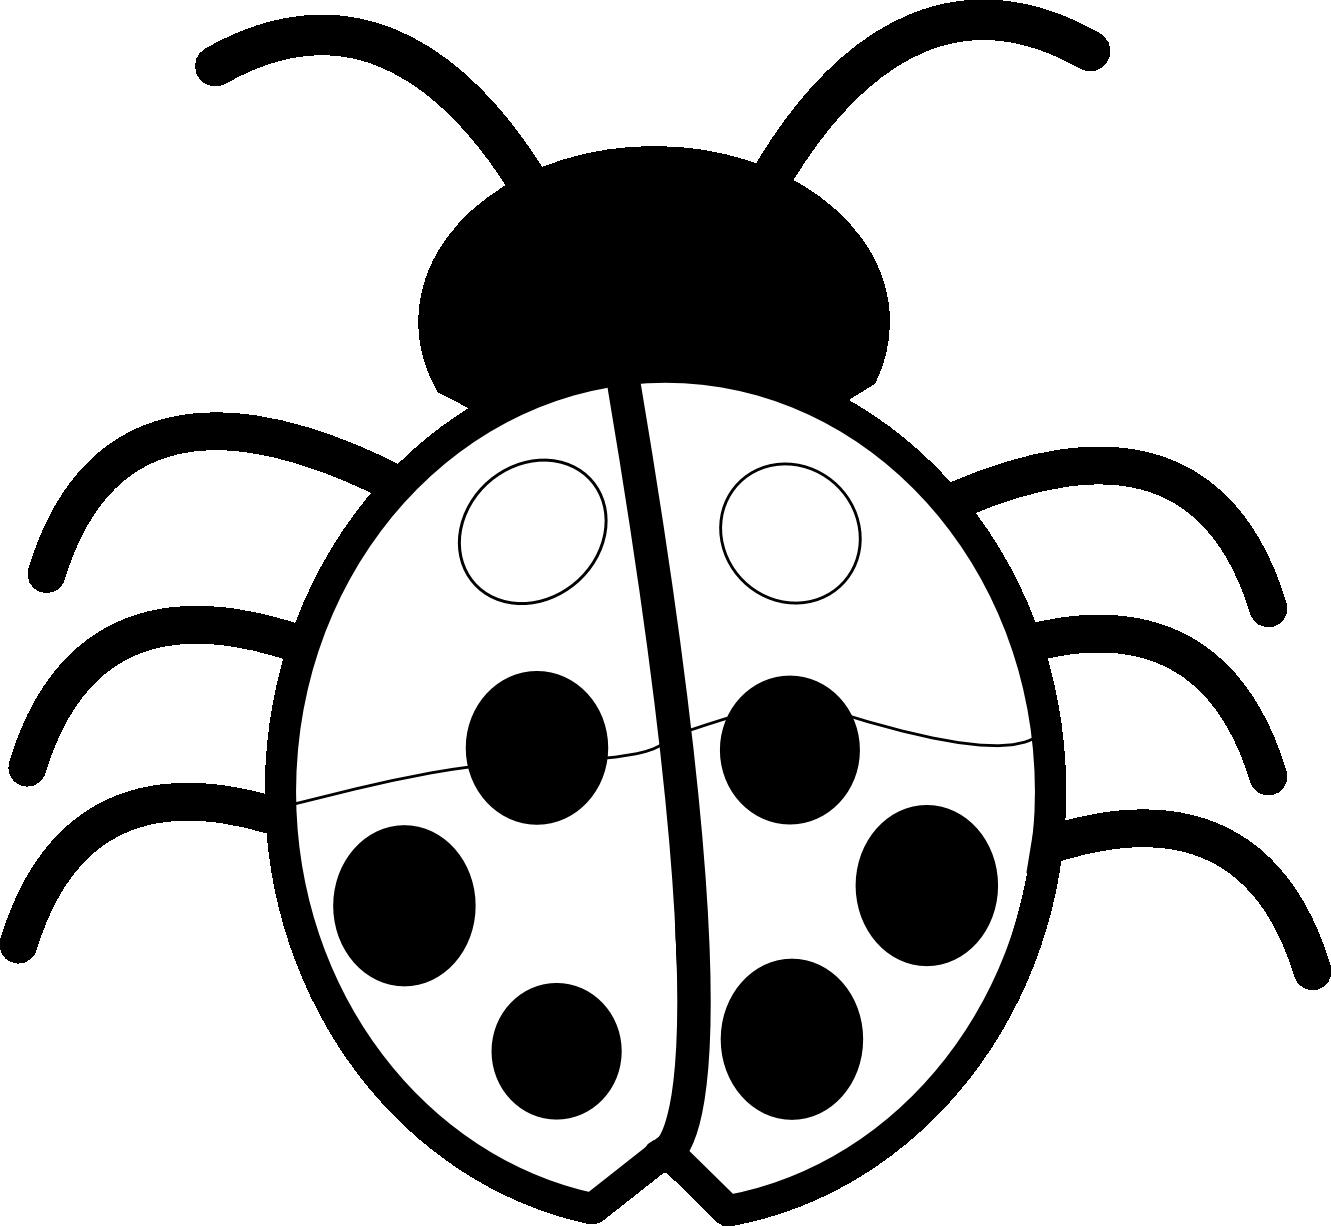 1331x1226 Ladybug Clipart Black And White Free Images